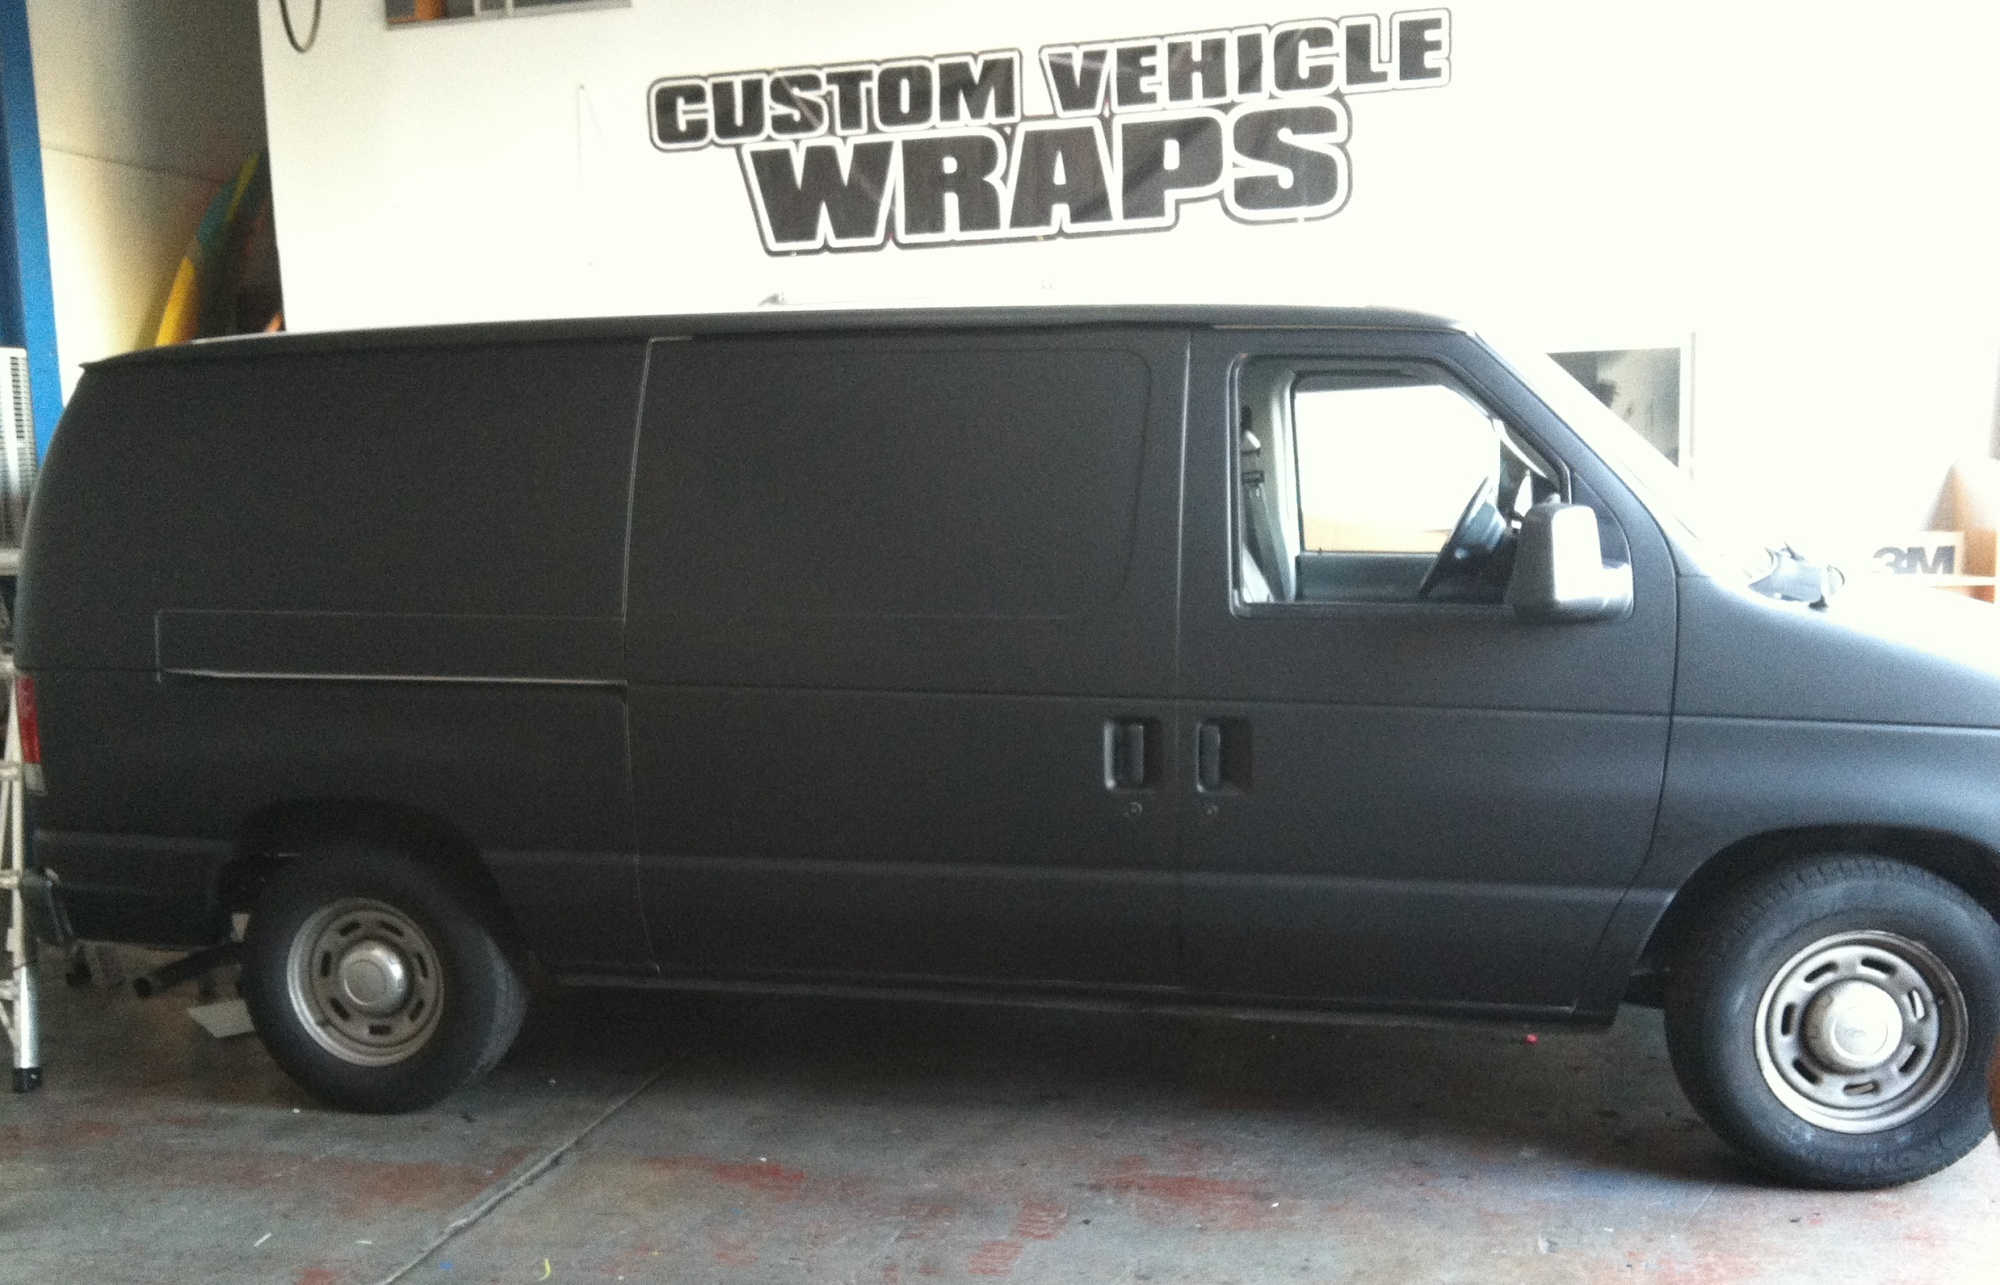 California Color Change Wraps Custom Vehicle Wraps